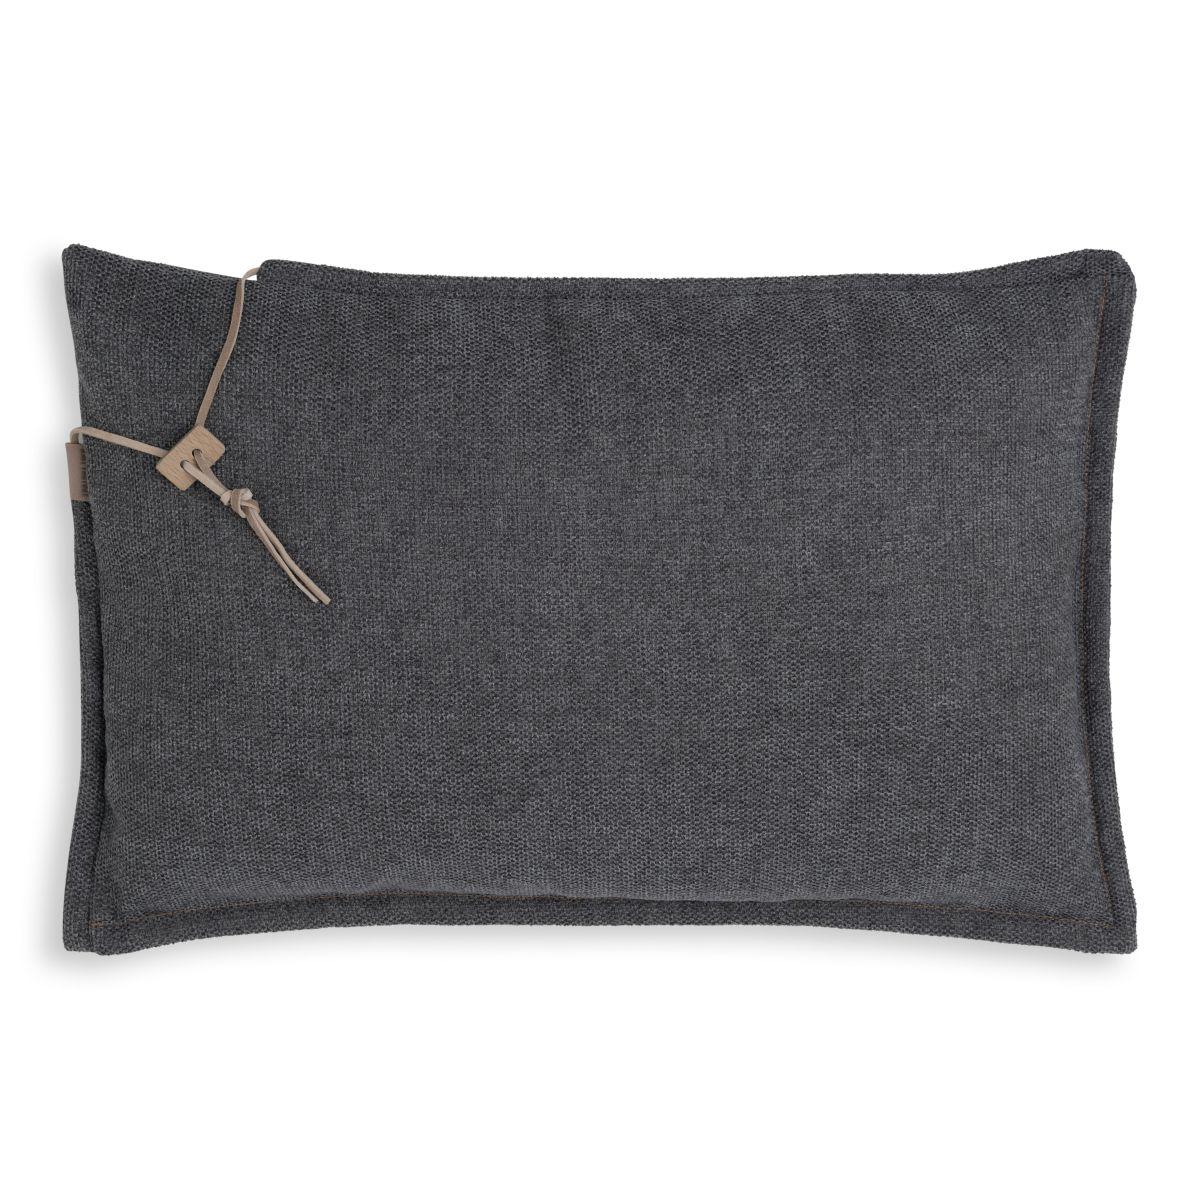 imre cushion anthracite 60x40